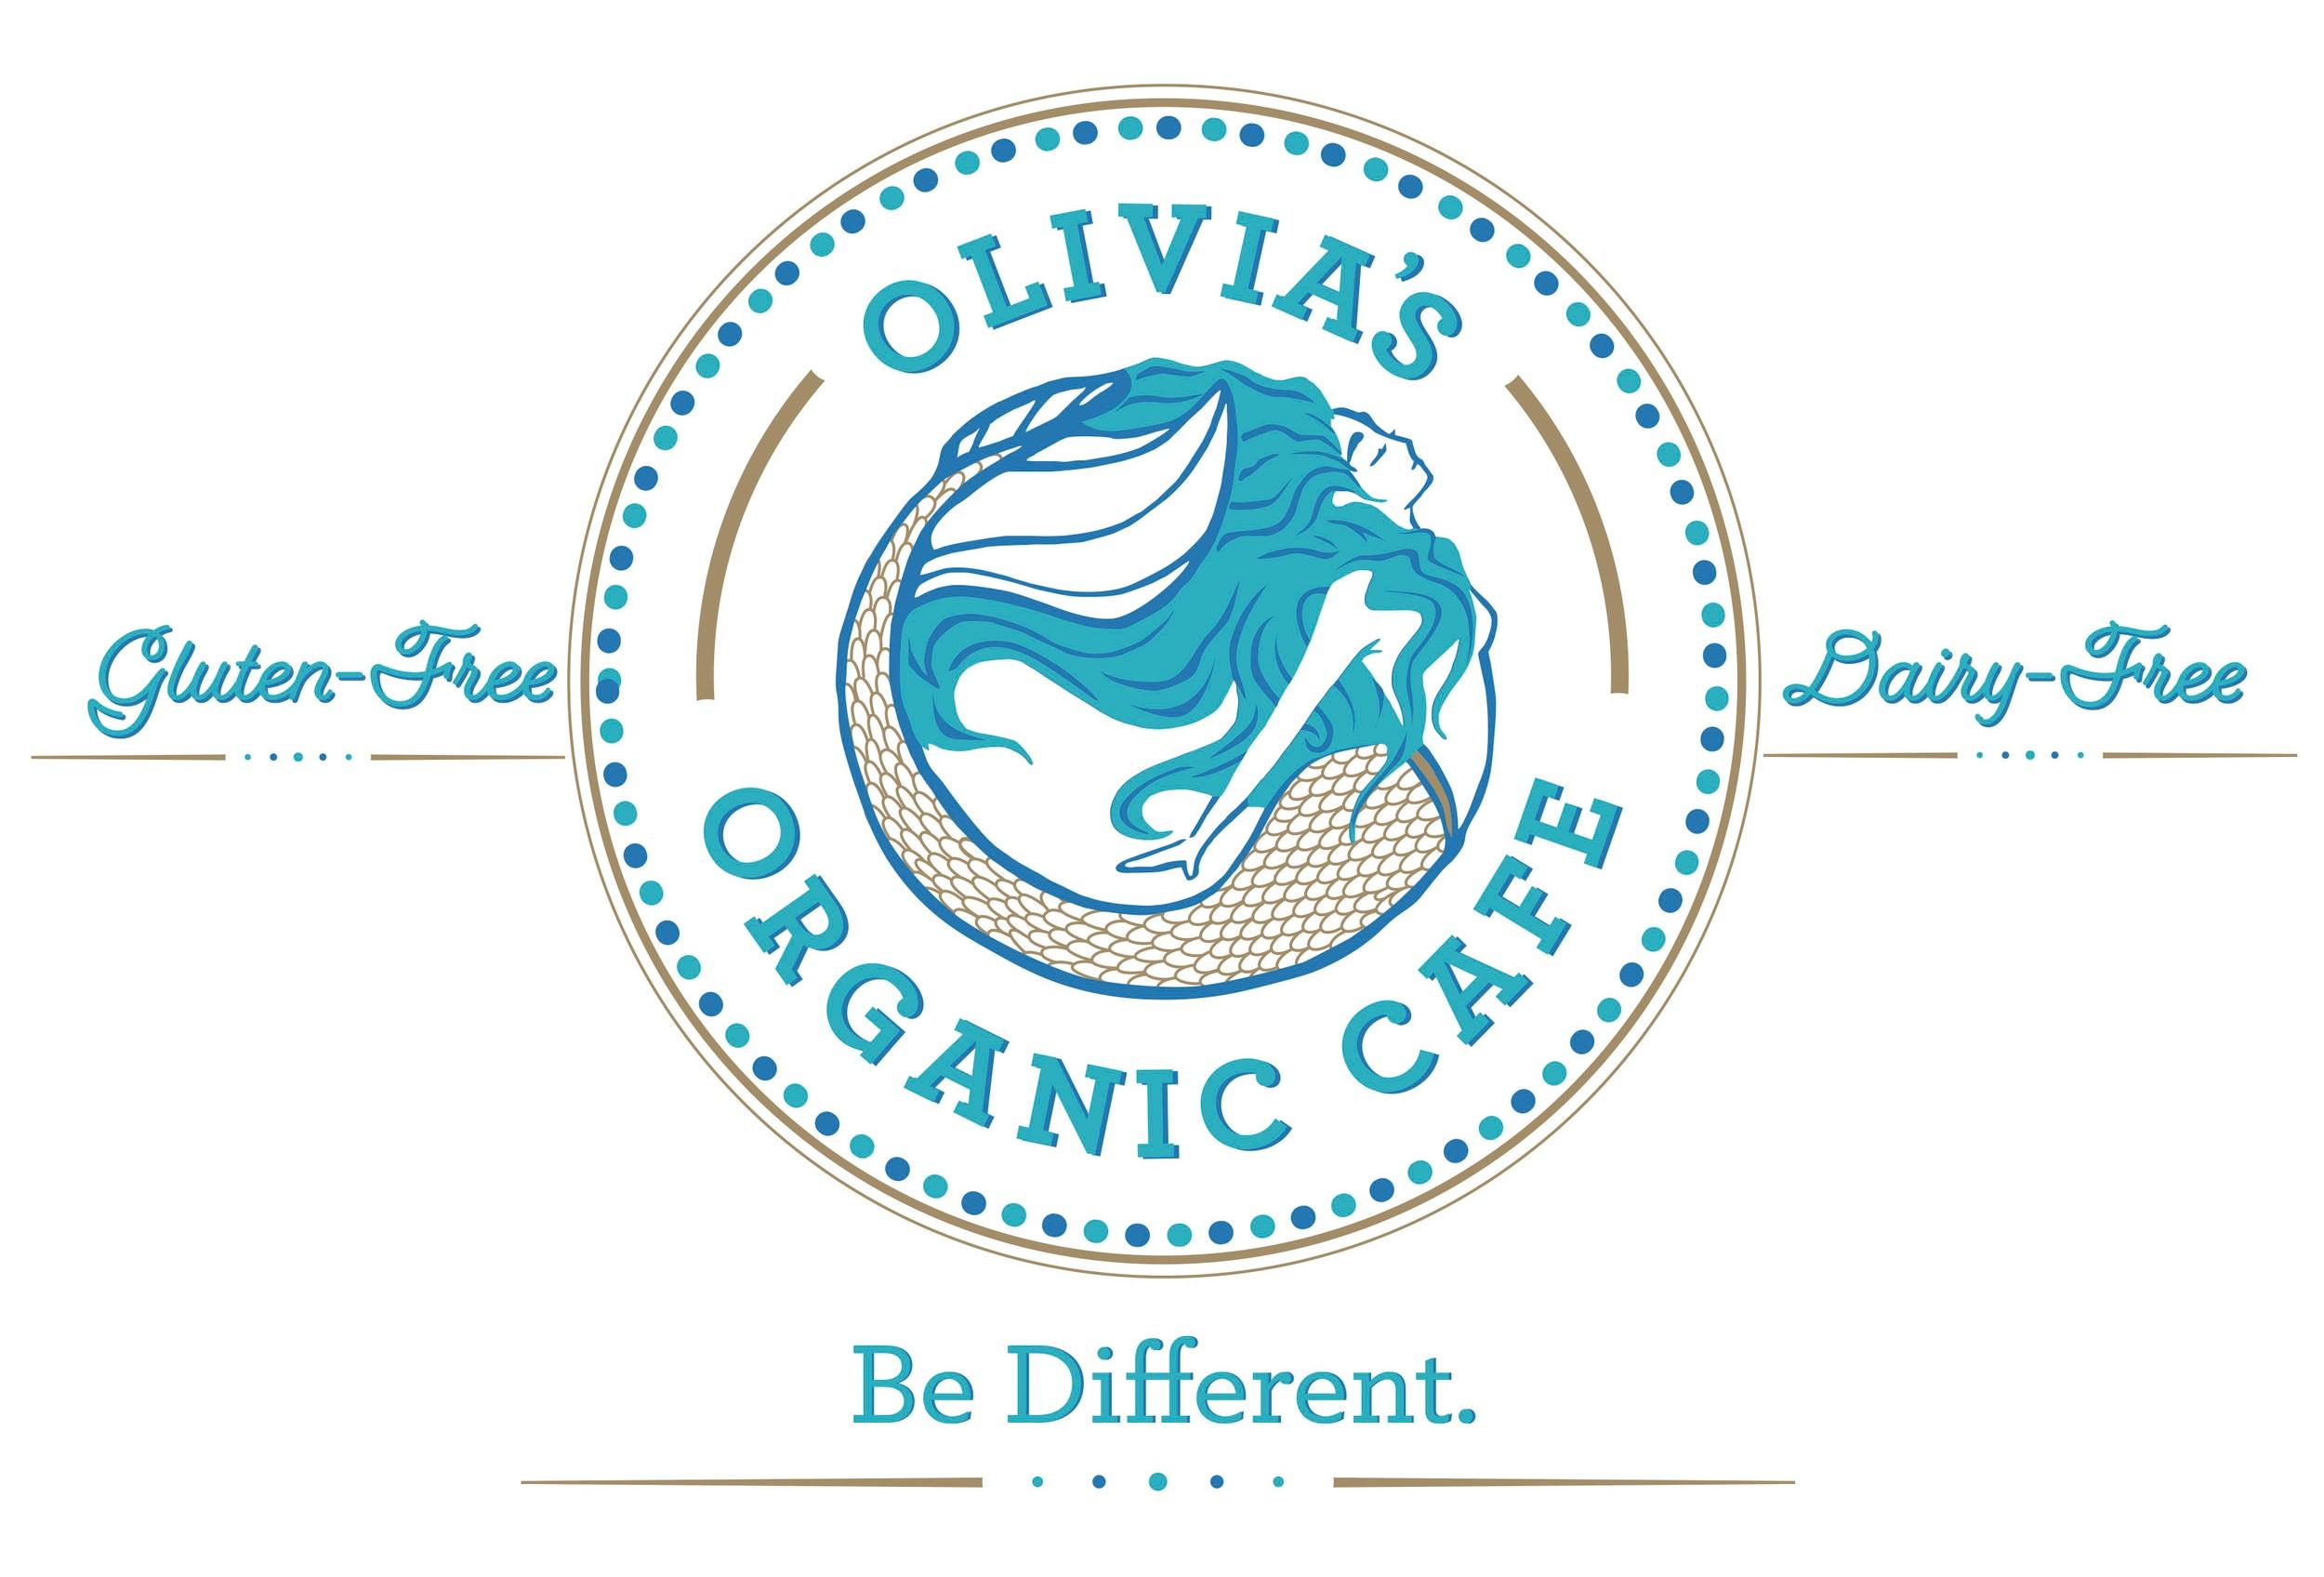 Olivia's Organic Café